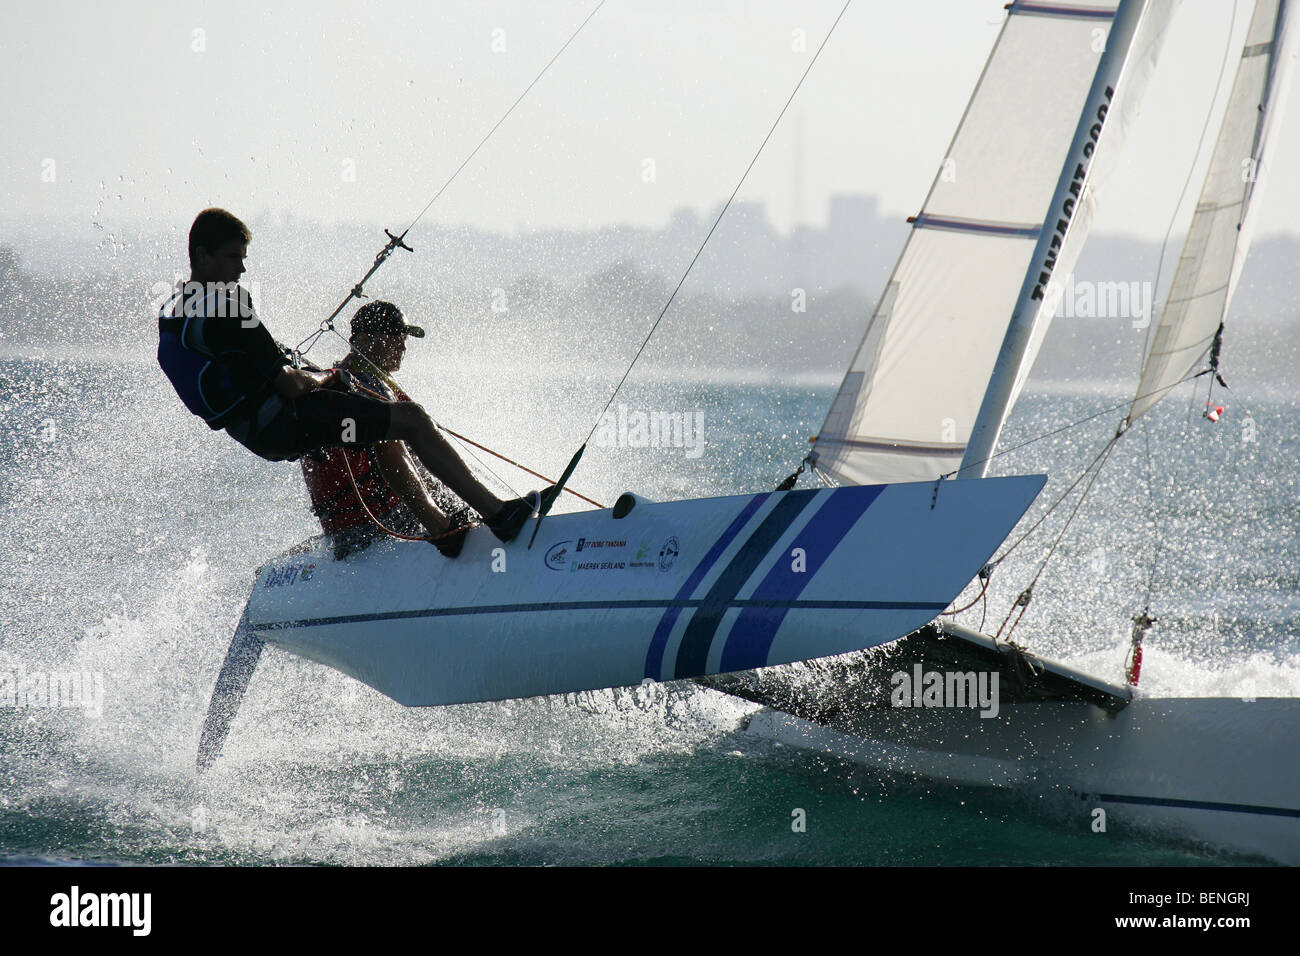 Sailors on a catamaran during the Tanzacat race near Dar es Salaam in Tanzania - Stock Image